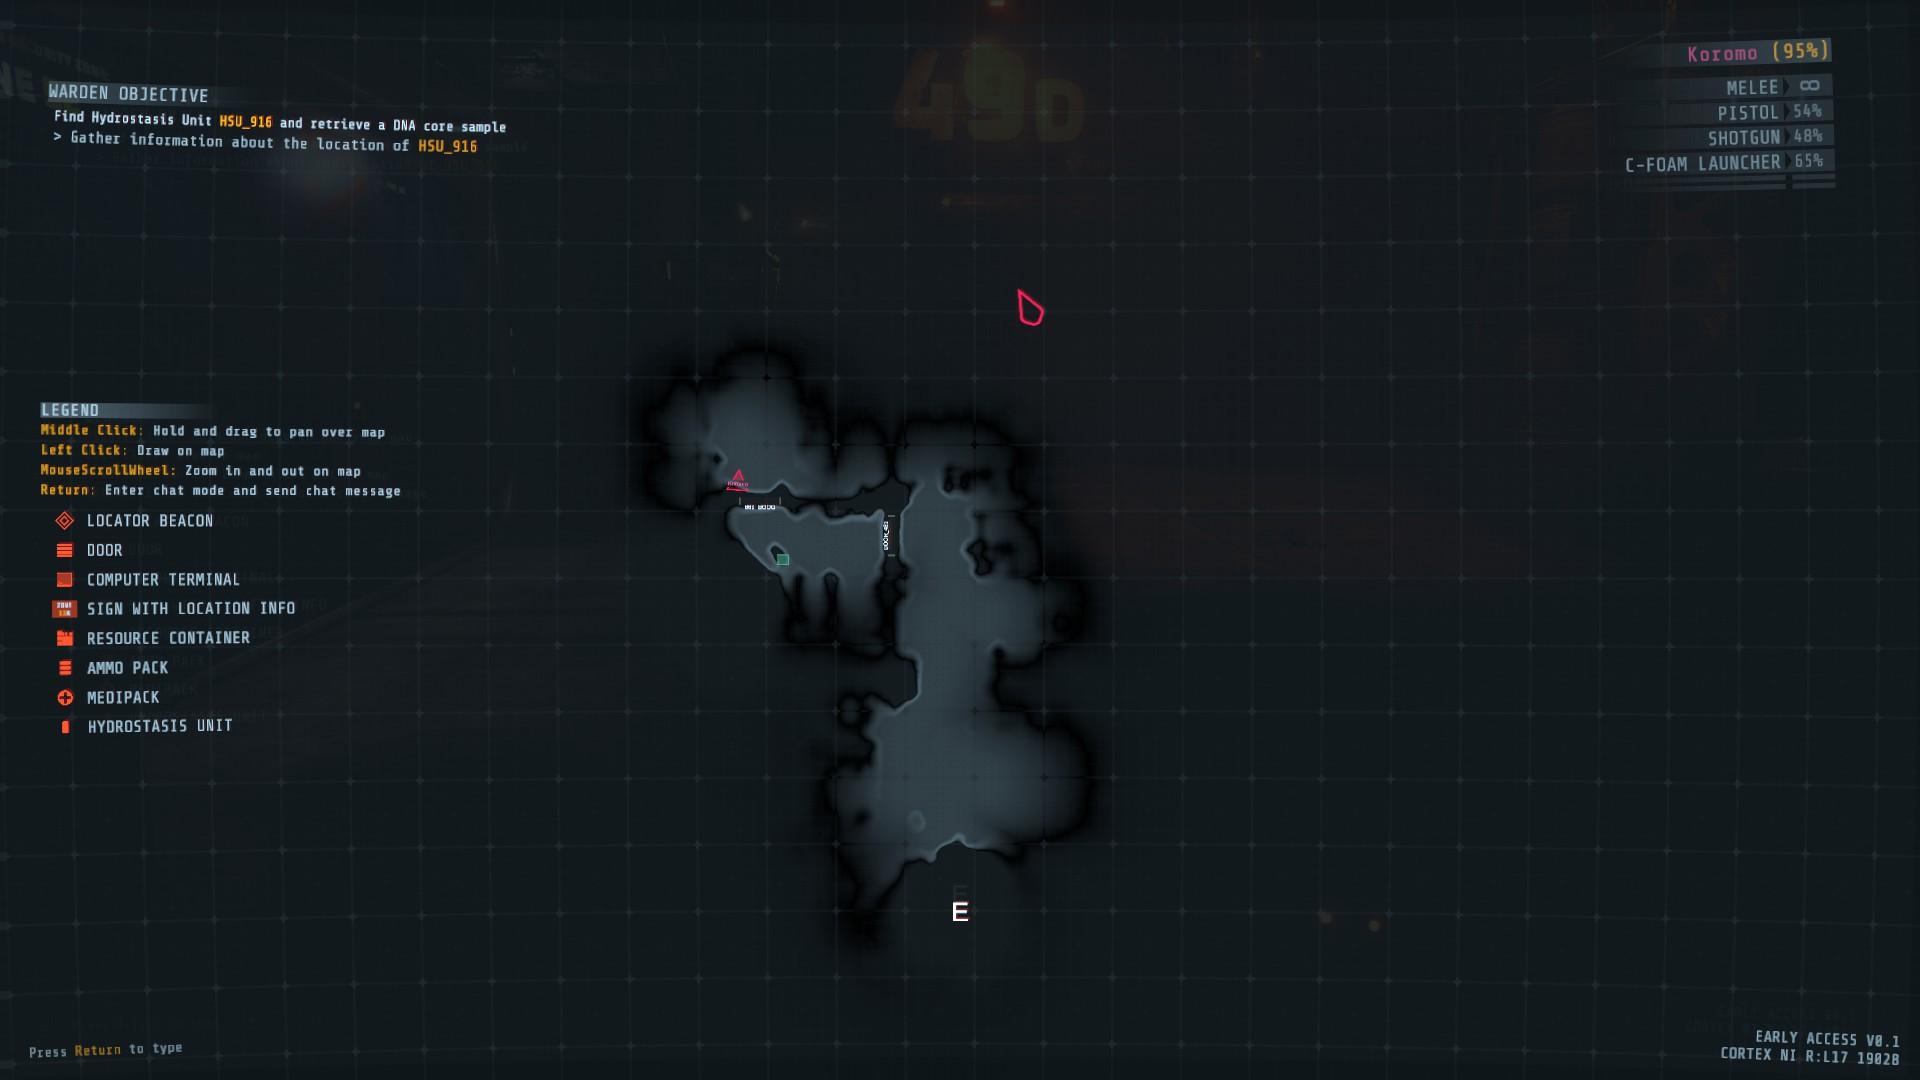 [PCゲーム]GTFO早期アクセス、そうだ、地下施設を調べにいこう。5